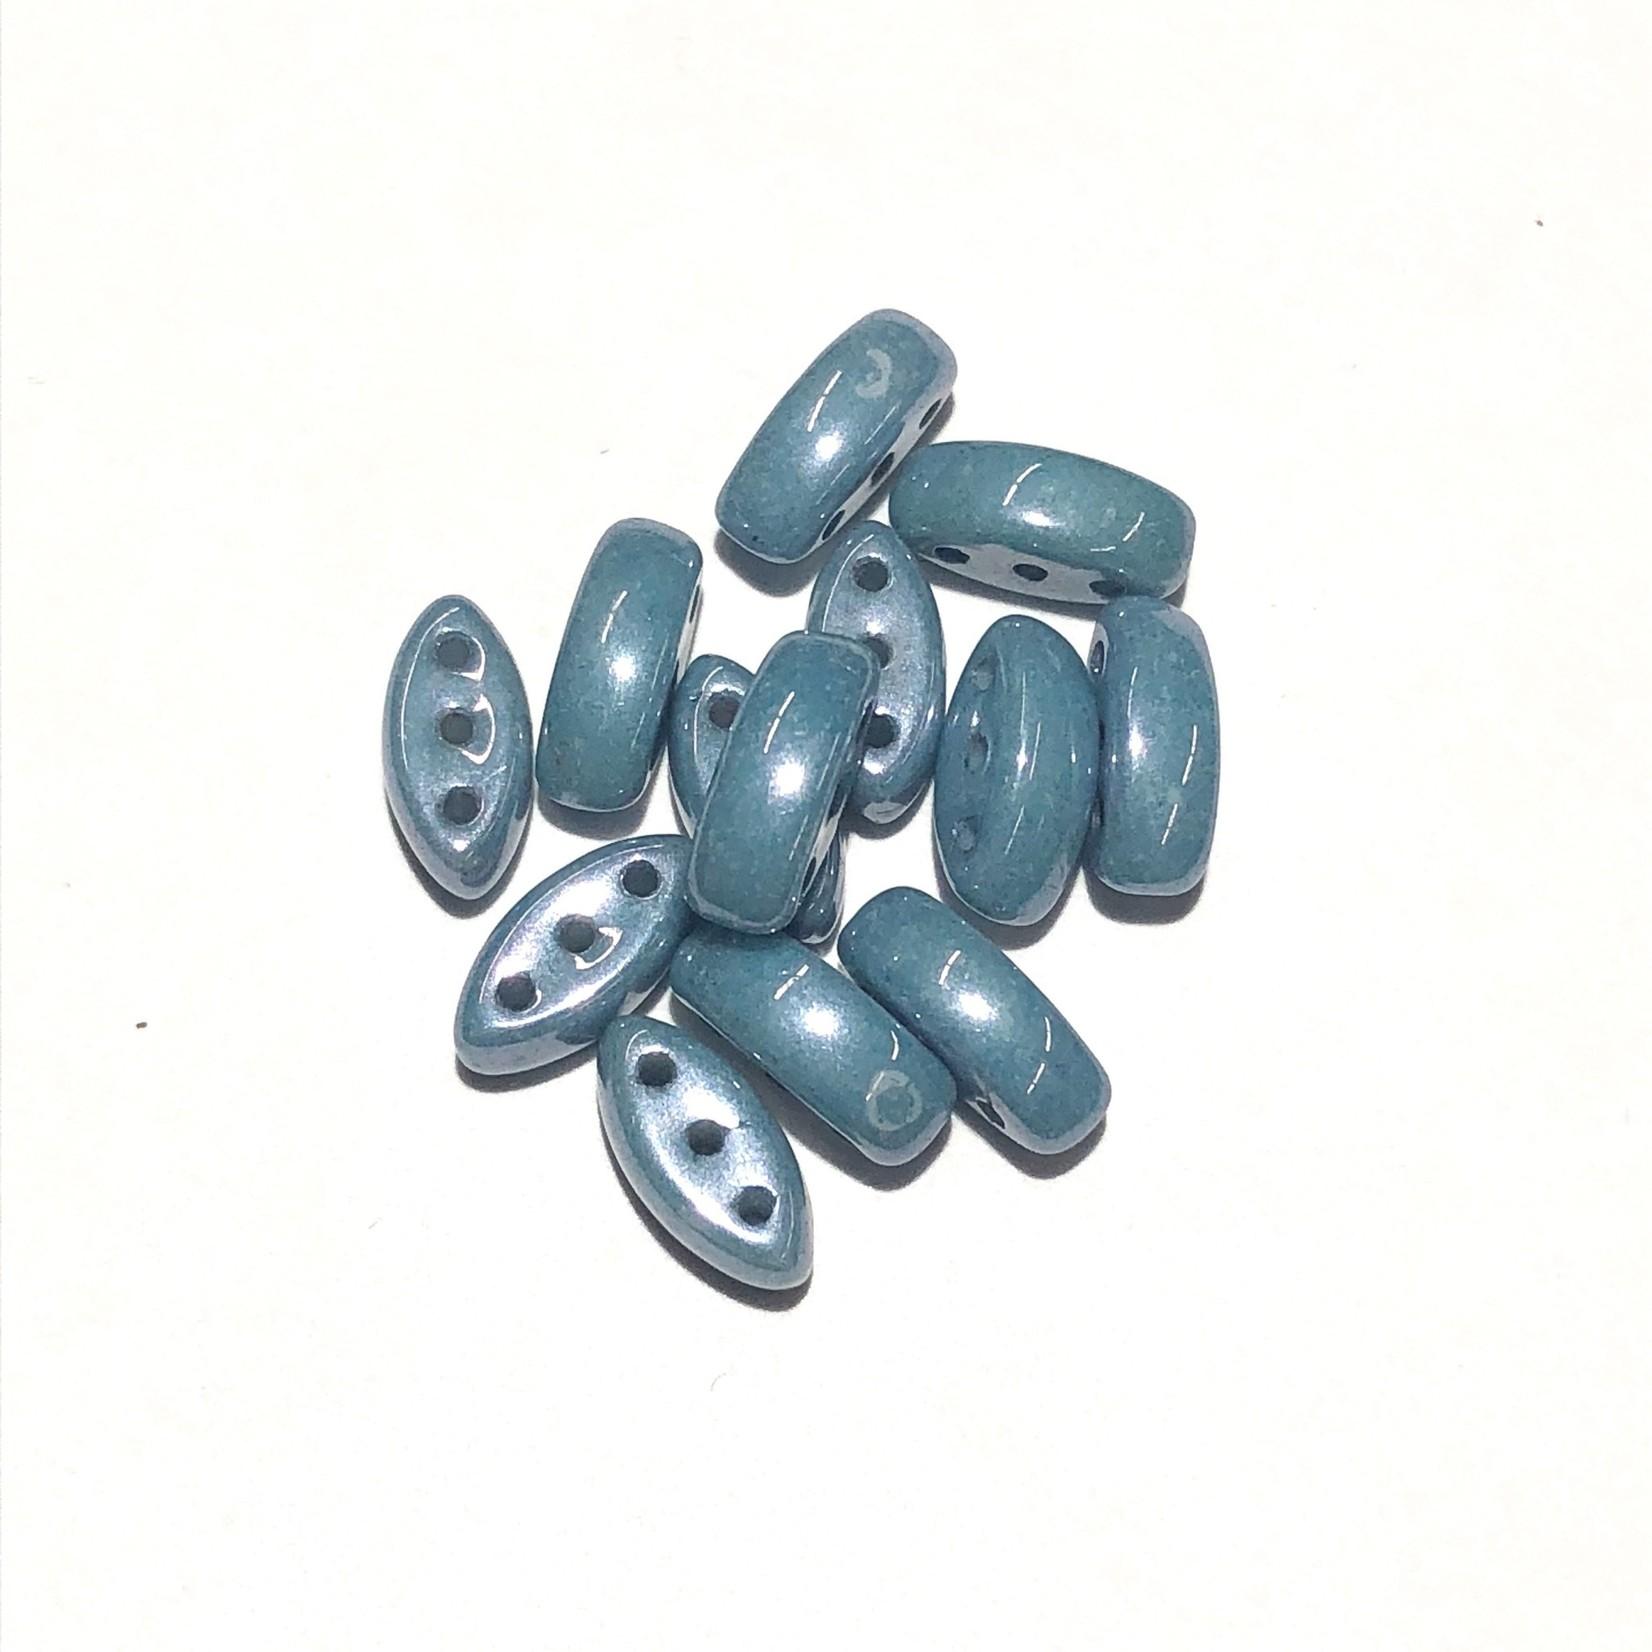 Cali Beads 3-Hole Chalk White/Dk Blue Luster 40pcs